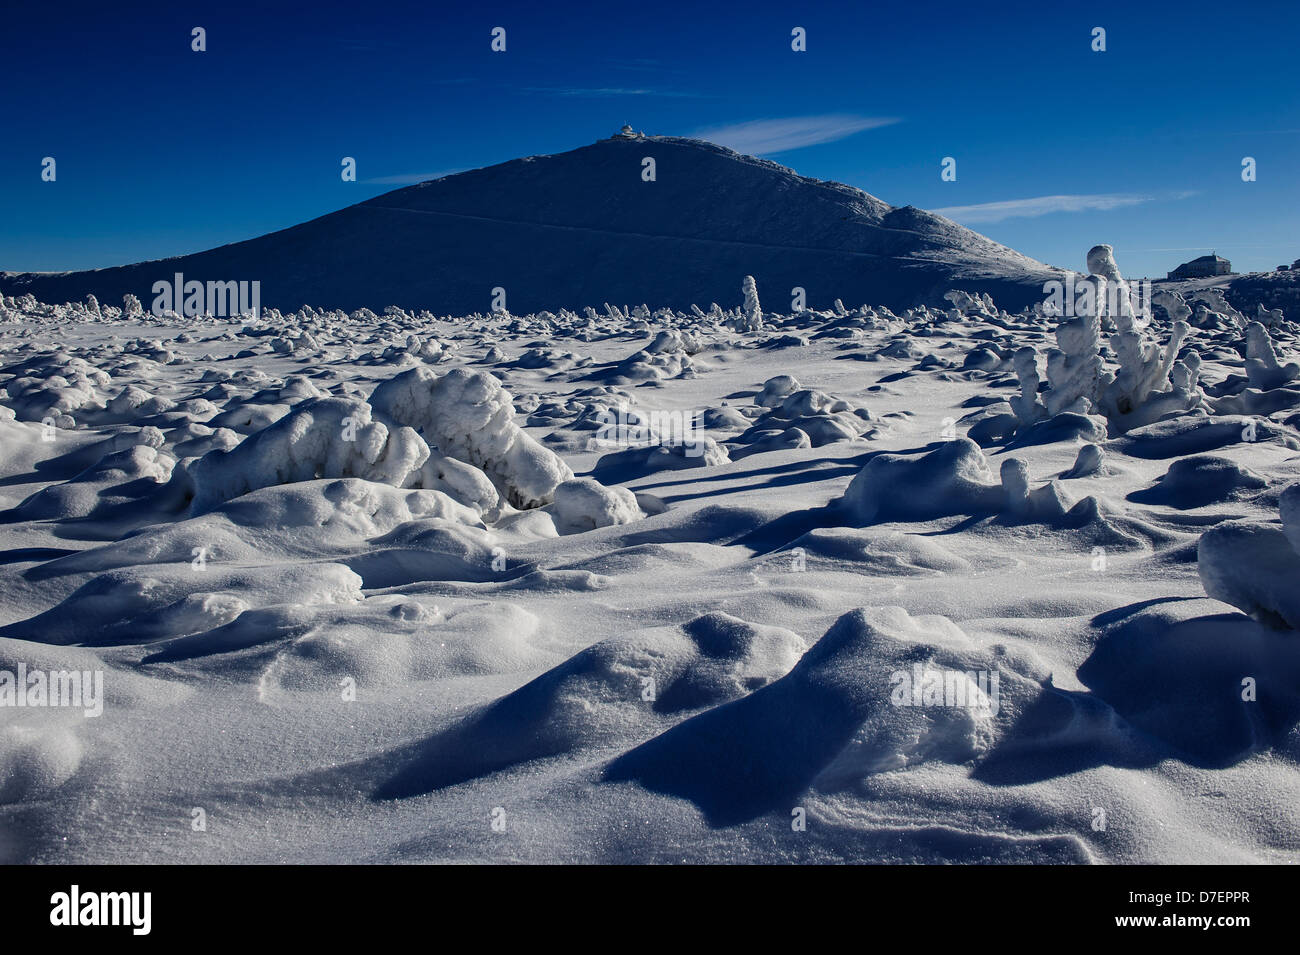 Vista de la Sniezka en las montañas Karkonosze, Polonia. Imagen De Stock